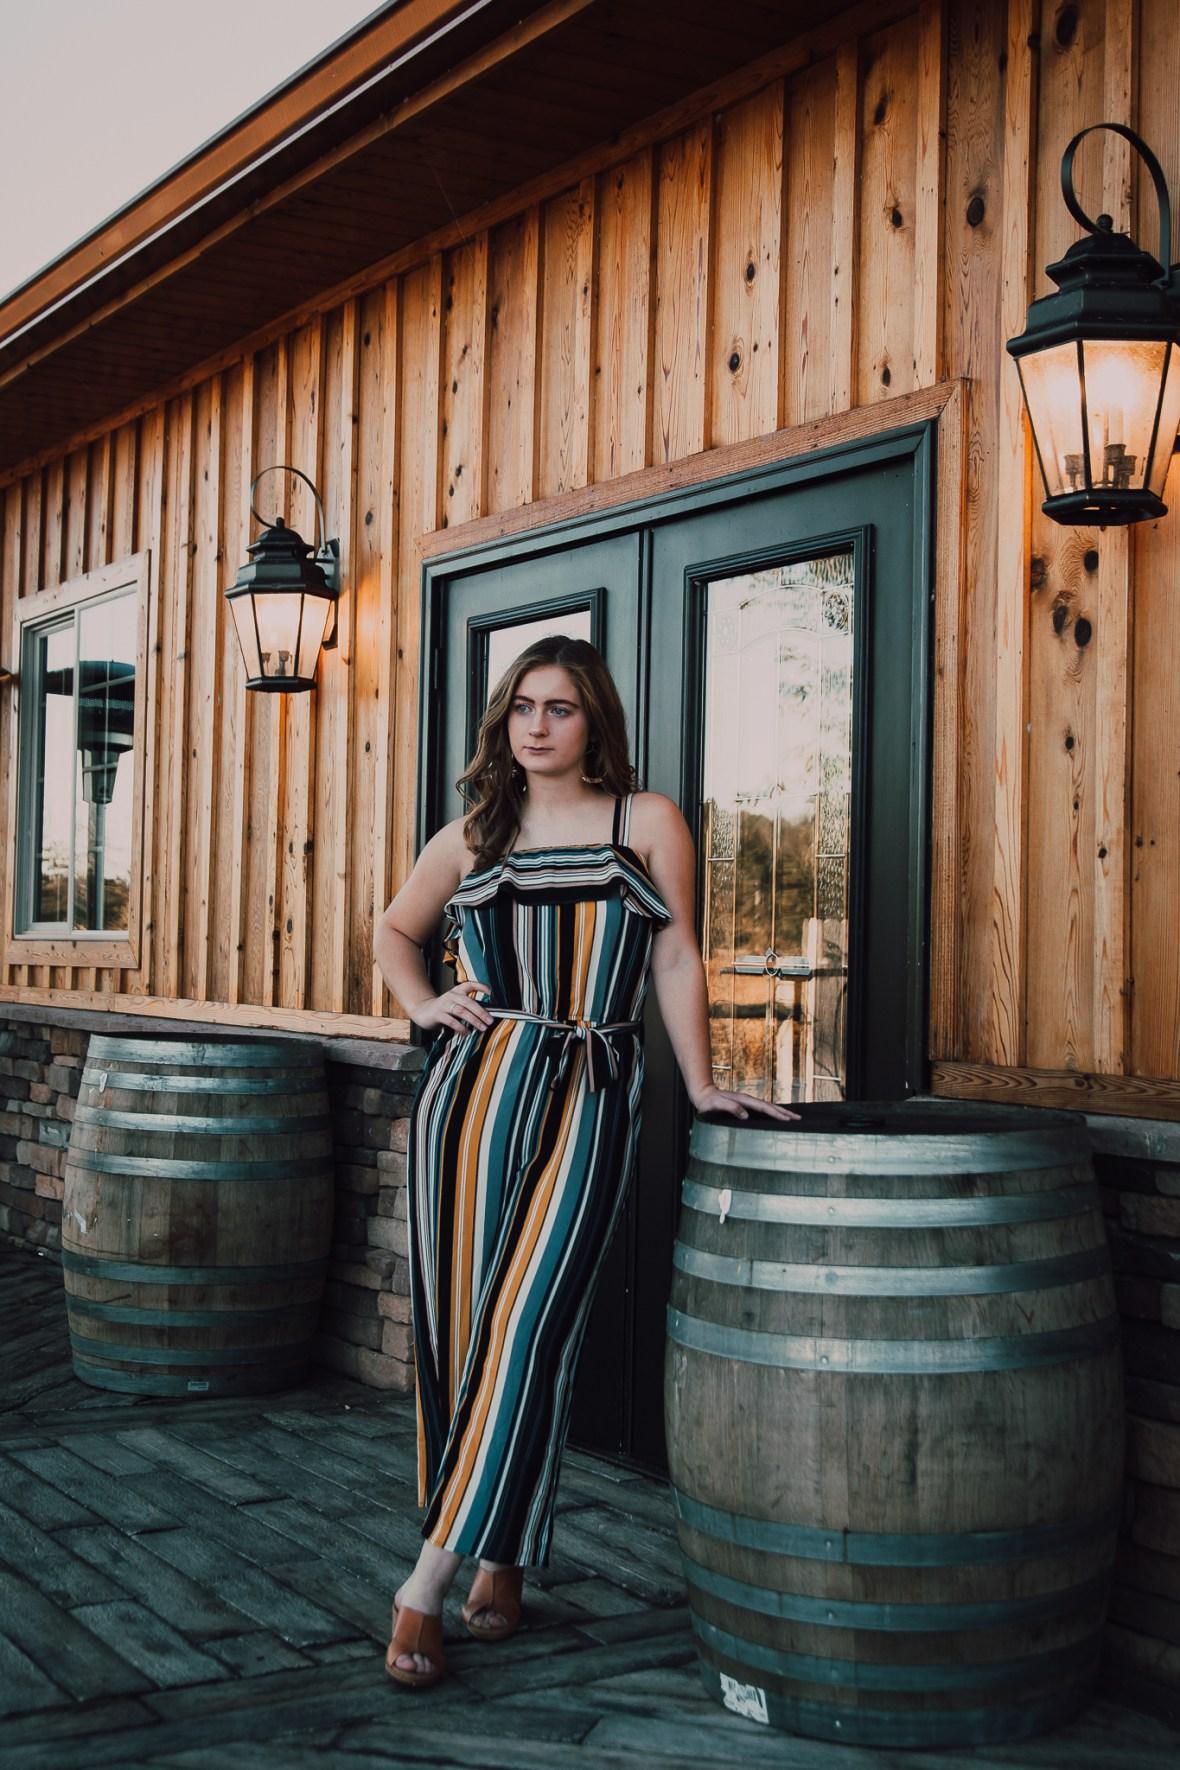 Burner's Farm and Winery Guston Kentucky